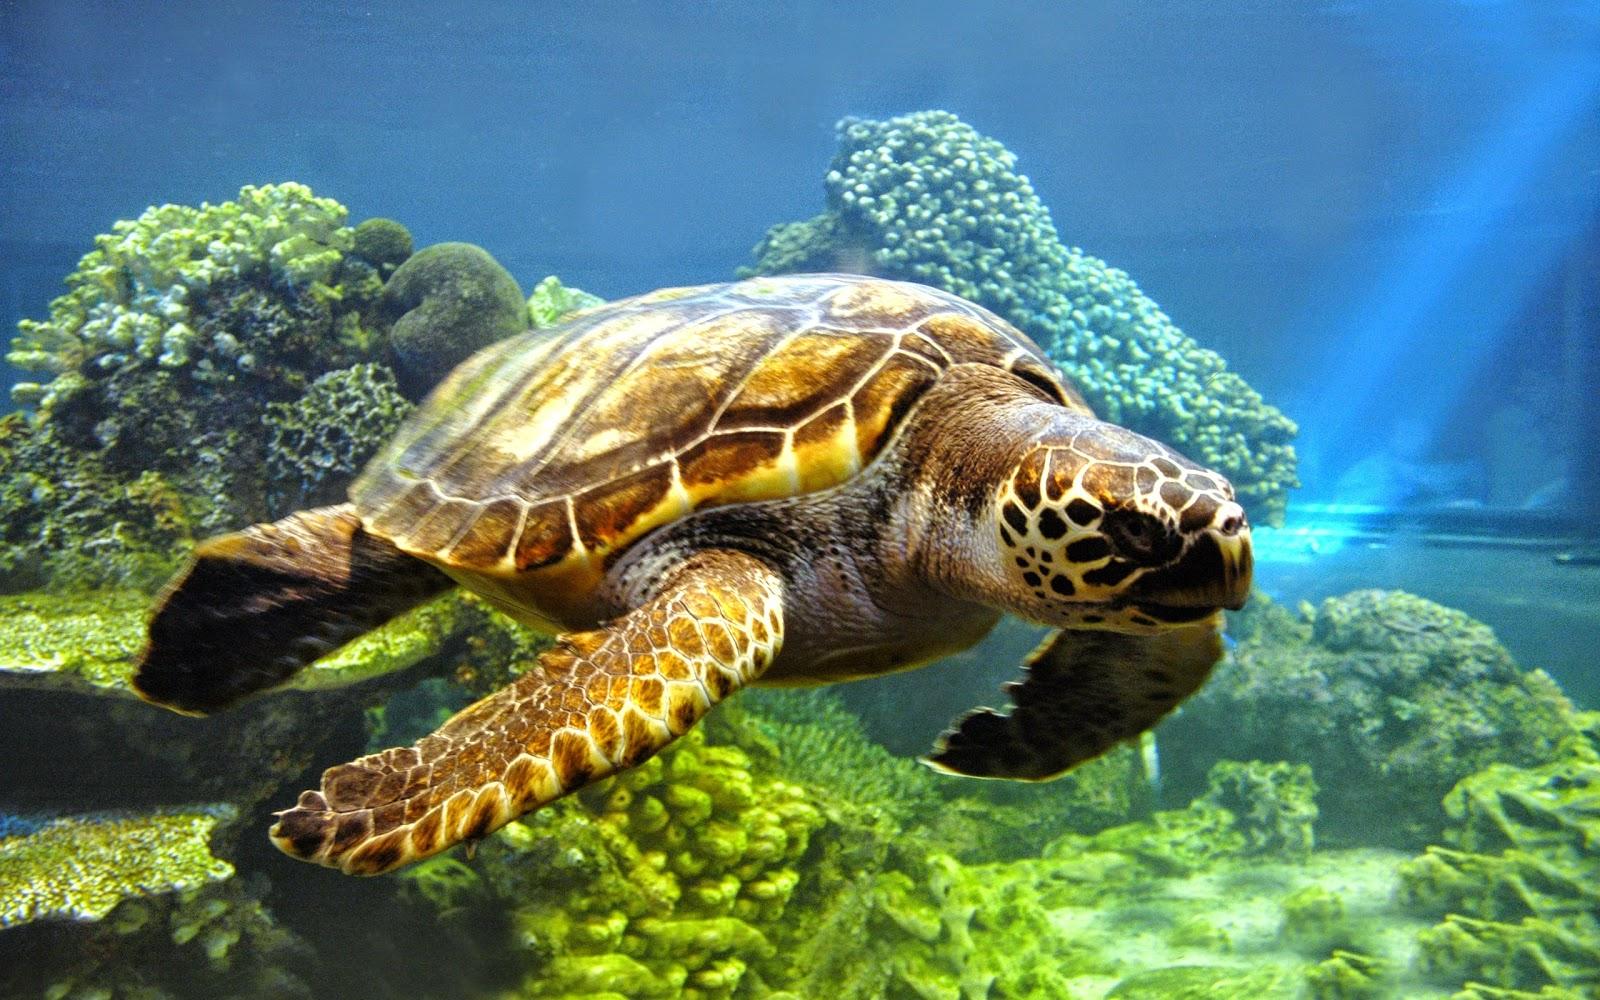 Sea Turtle - HD Wallpapers | Earth Blog